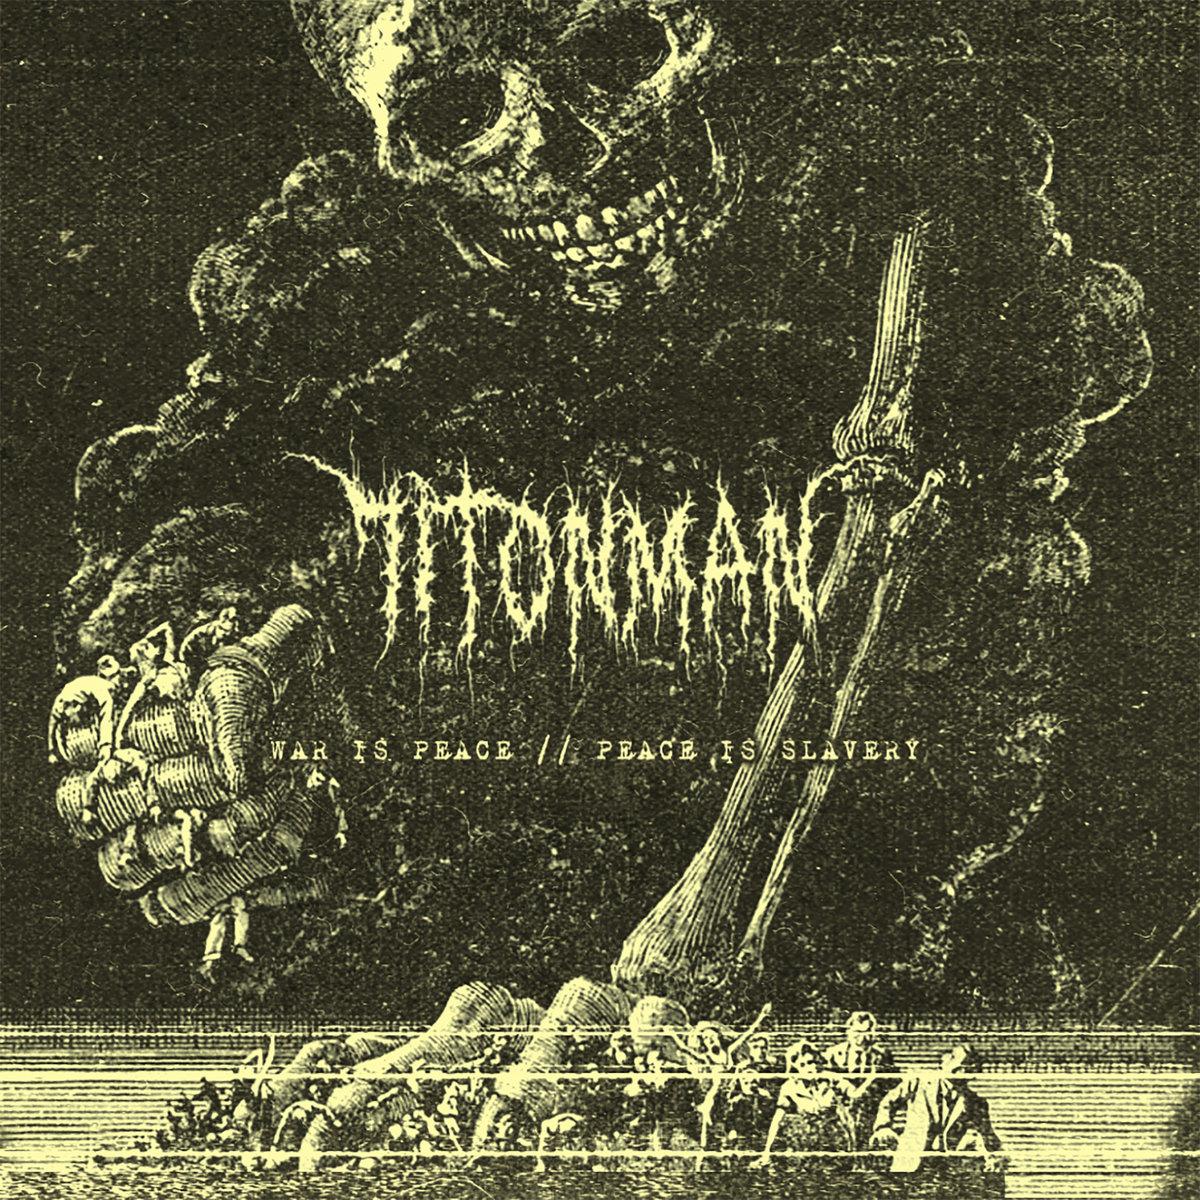 71TONMAN War Is Peace Peace Is Slavery Album Cover Artwork